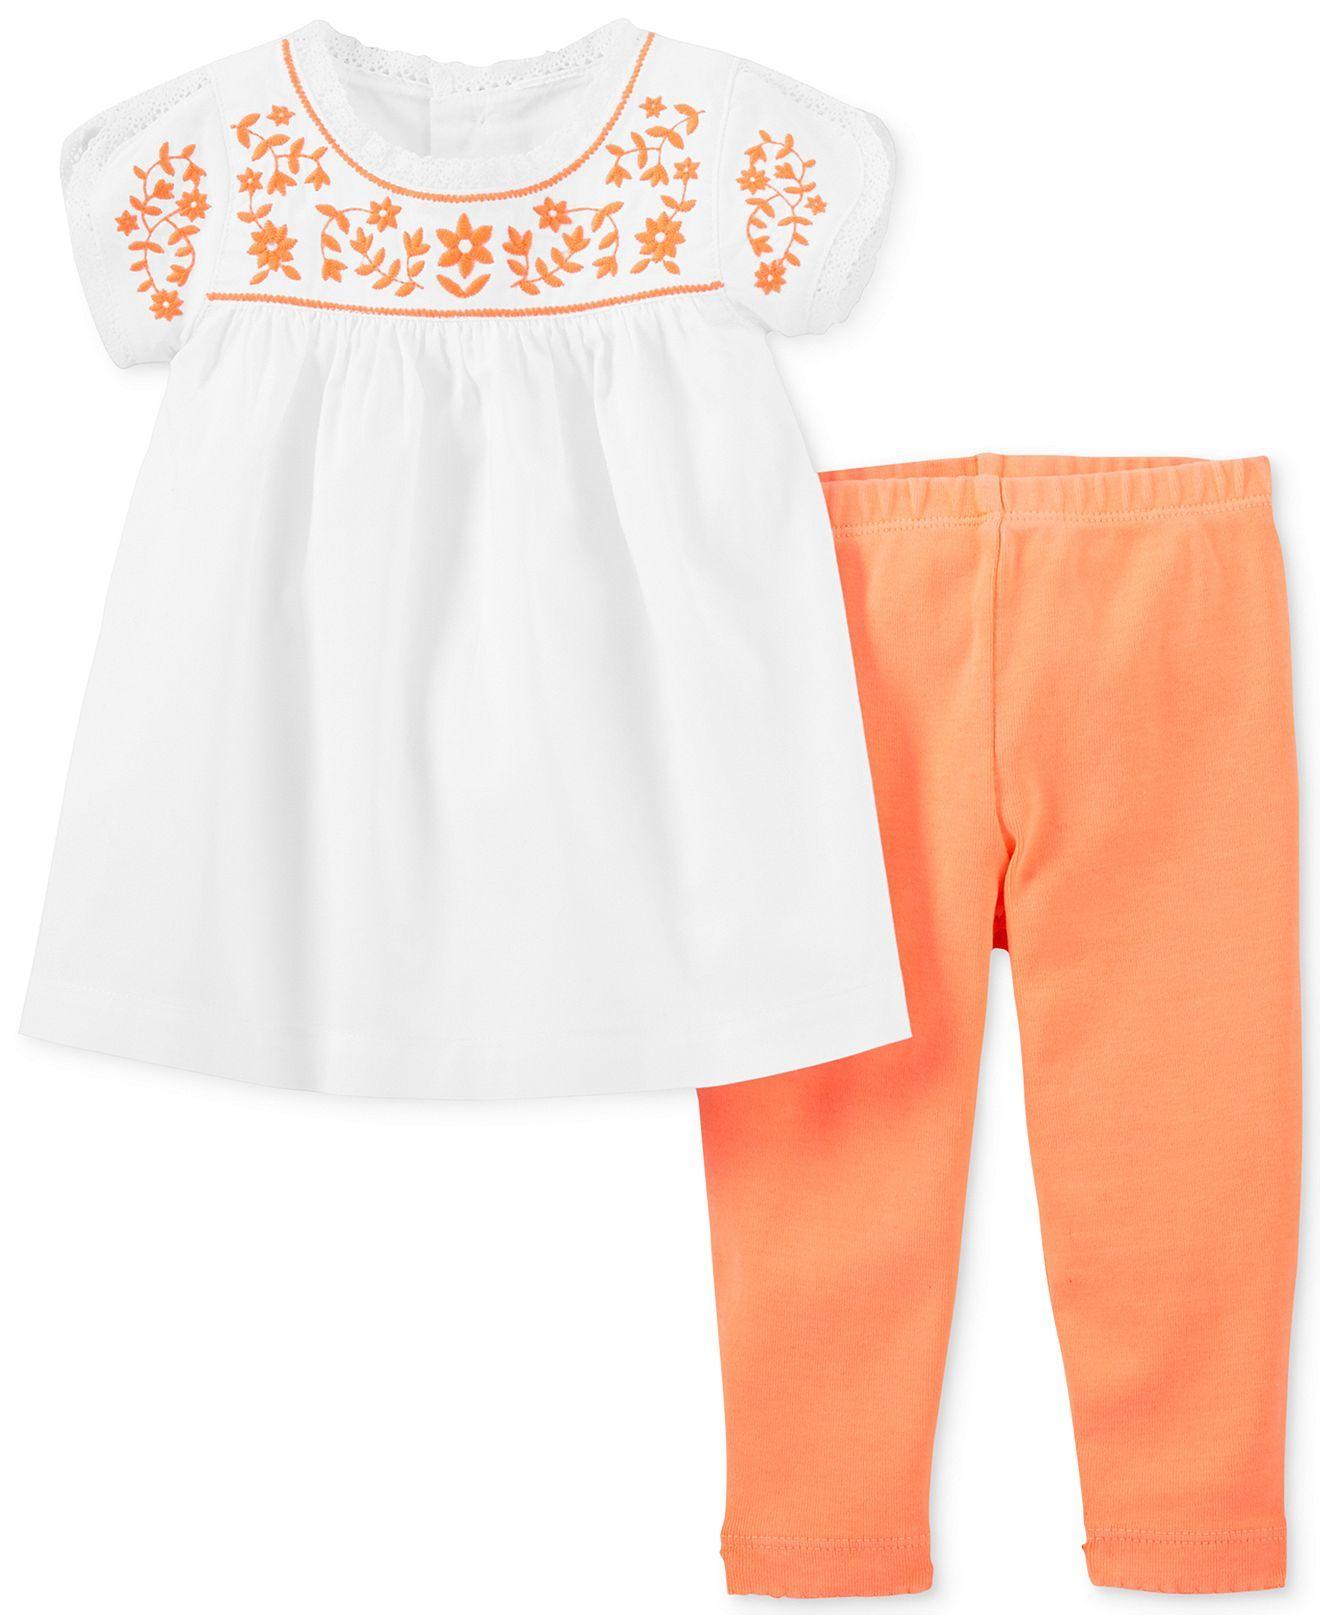 148958baafbe8 Carter's Baby Girls' 2-Piece Top & Leggings Set - Kids Baby Girl (0 ...